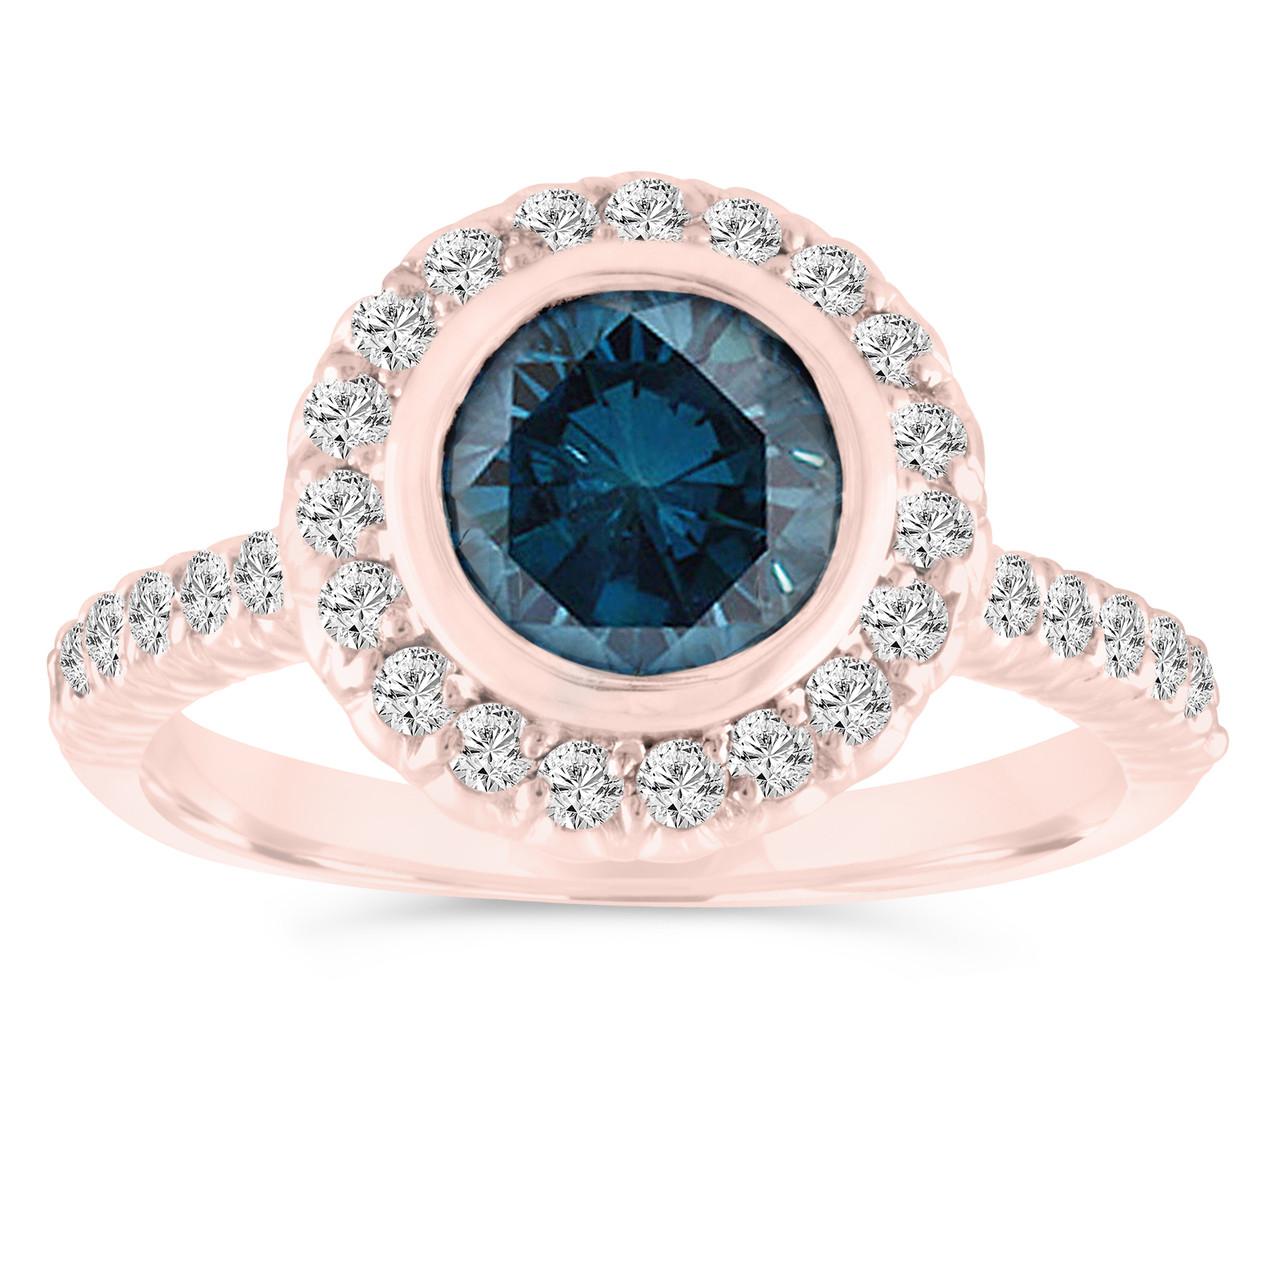 Bezel Set Blue Diamond Engagement Ring 14k Rose Gold Wedding Ring